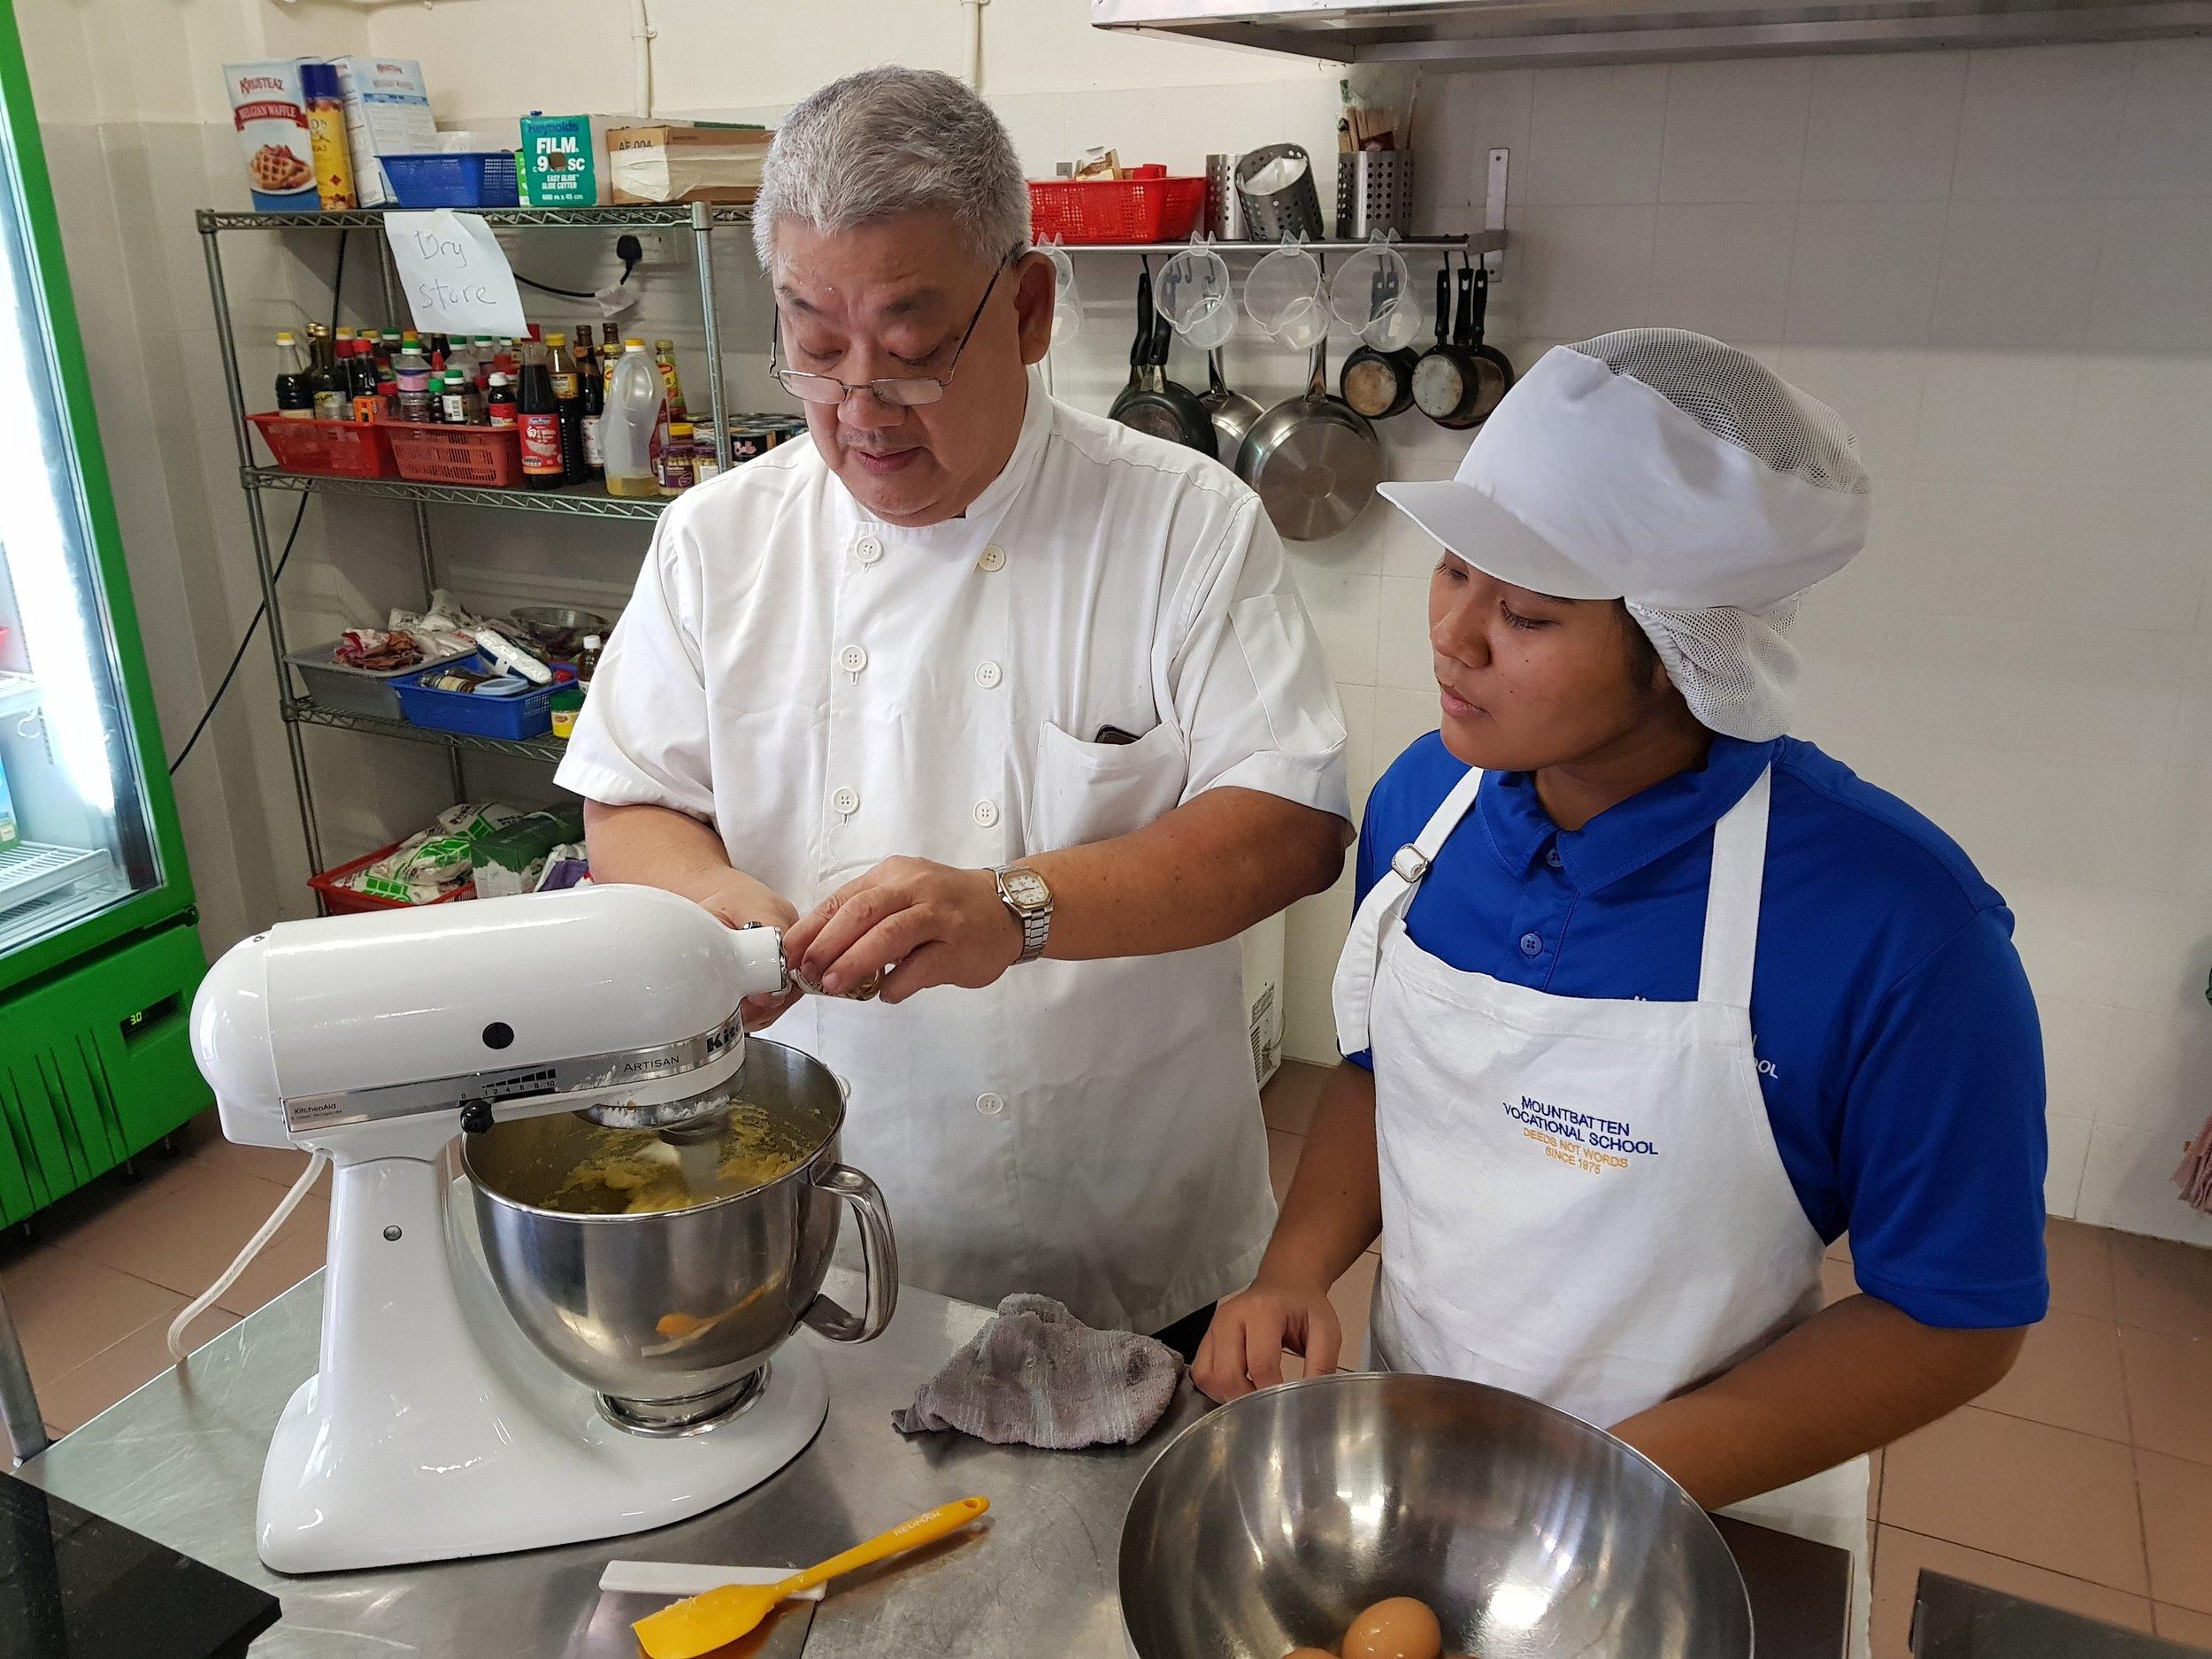 Mountbatten Vocataional School Chef Instructor Larry Loh with Student Farhana.jpg